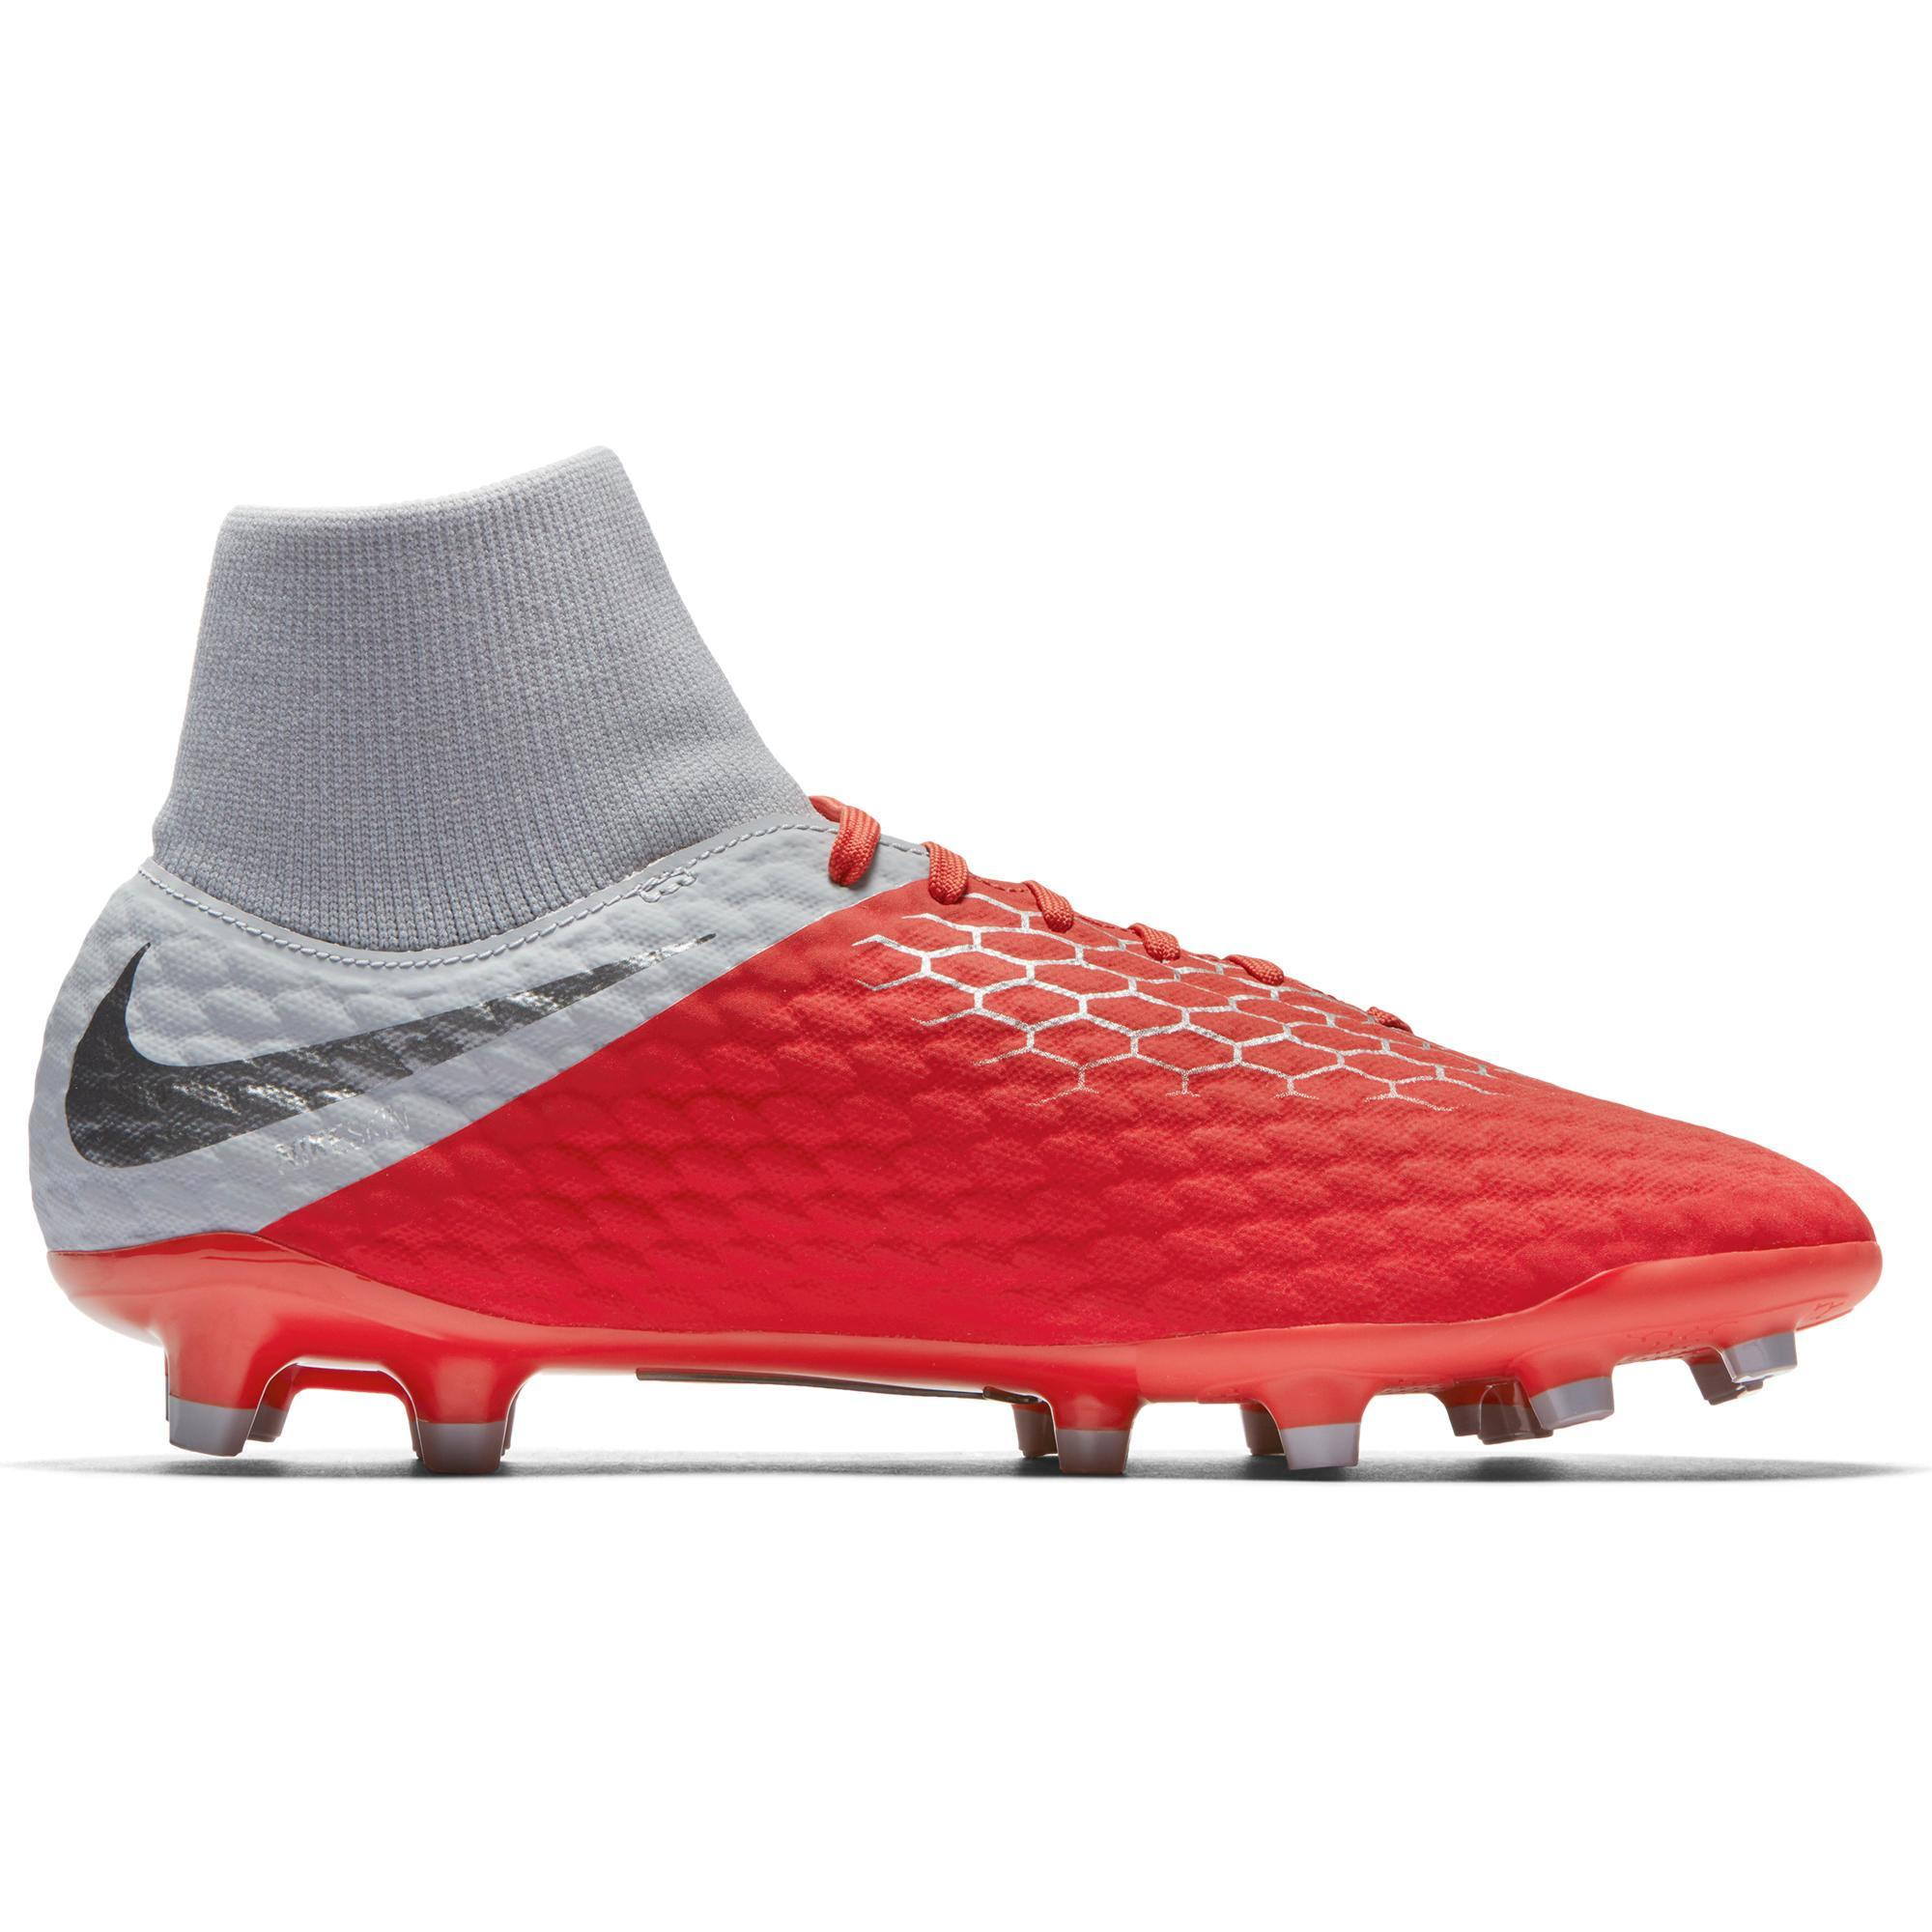 Nike Voetbalschoenen Hypervenom Phantom III Academy Dynamic Fit FG voor volwassenen